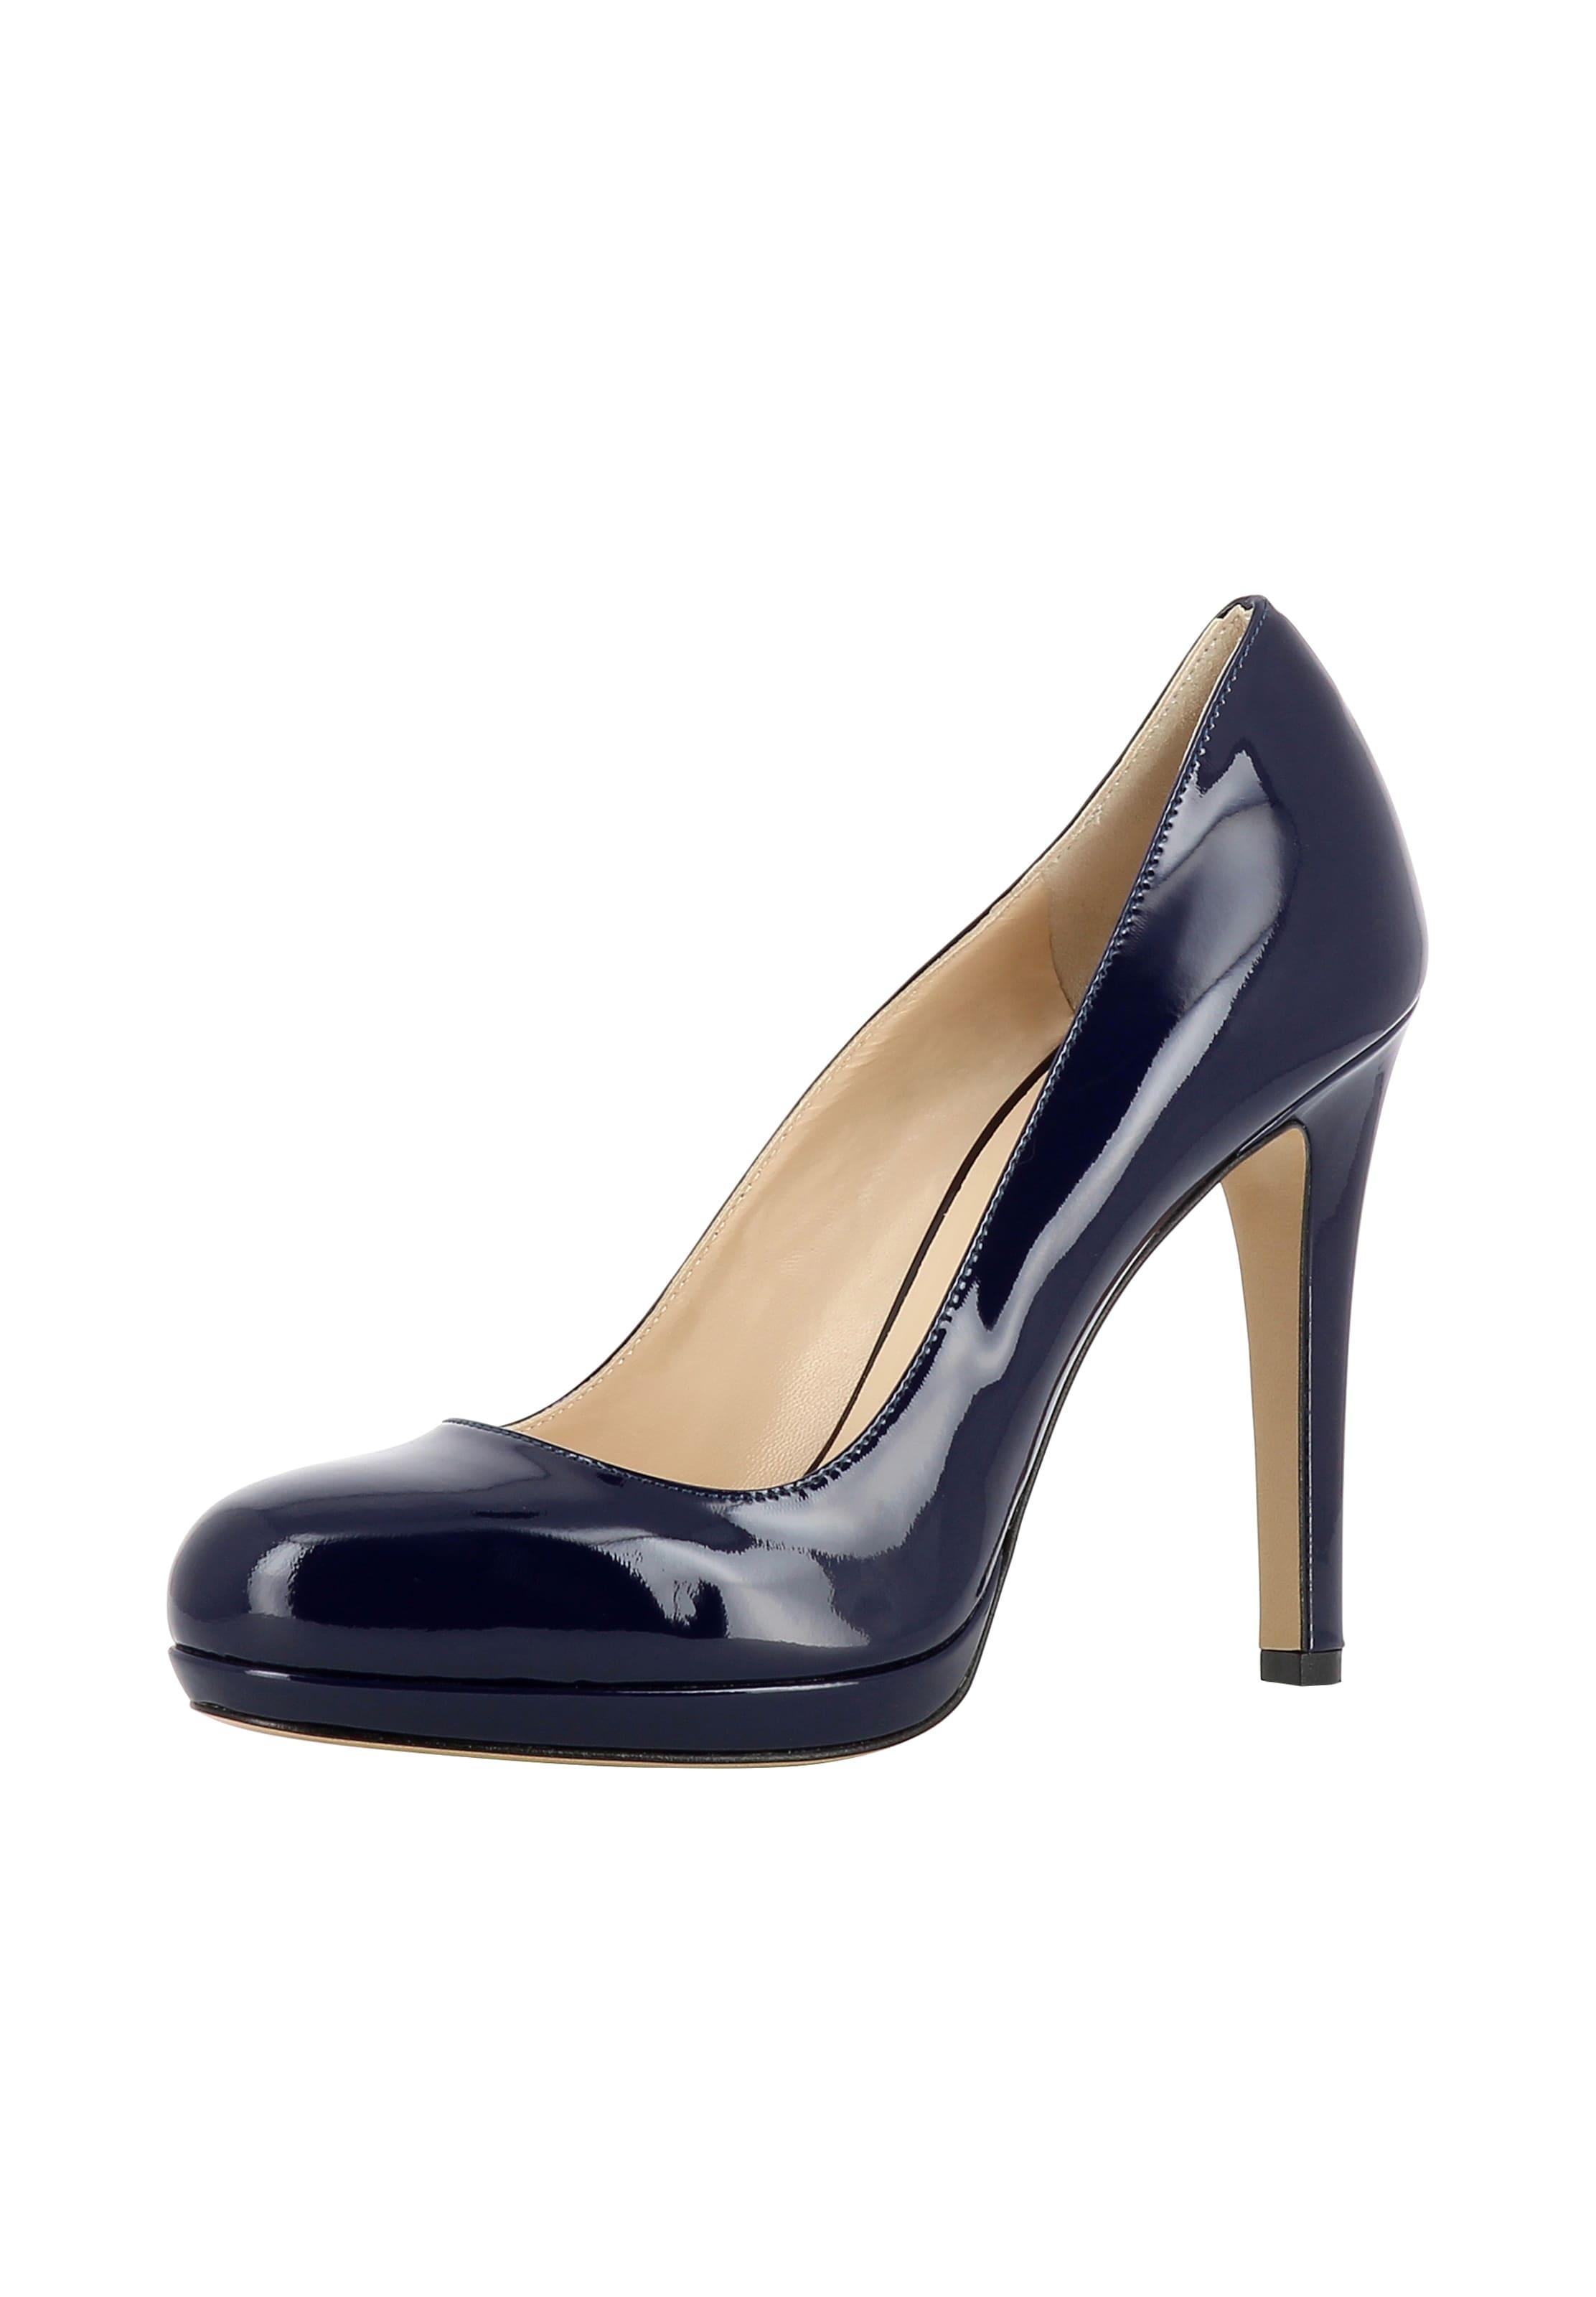 Haltbare Mode Mode Haltbare billige Schuhe EVITA | Damen Pumps 'CRISTINA' Schuhe Gut getragene Schuhe 861cae